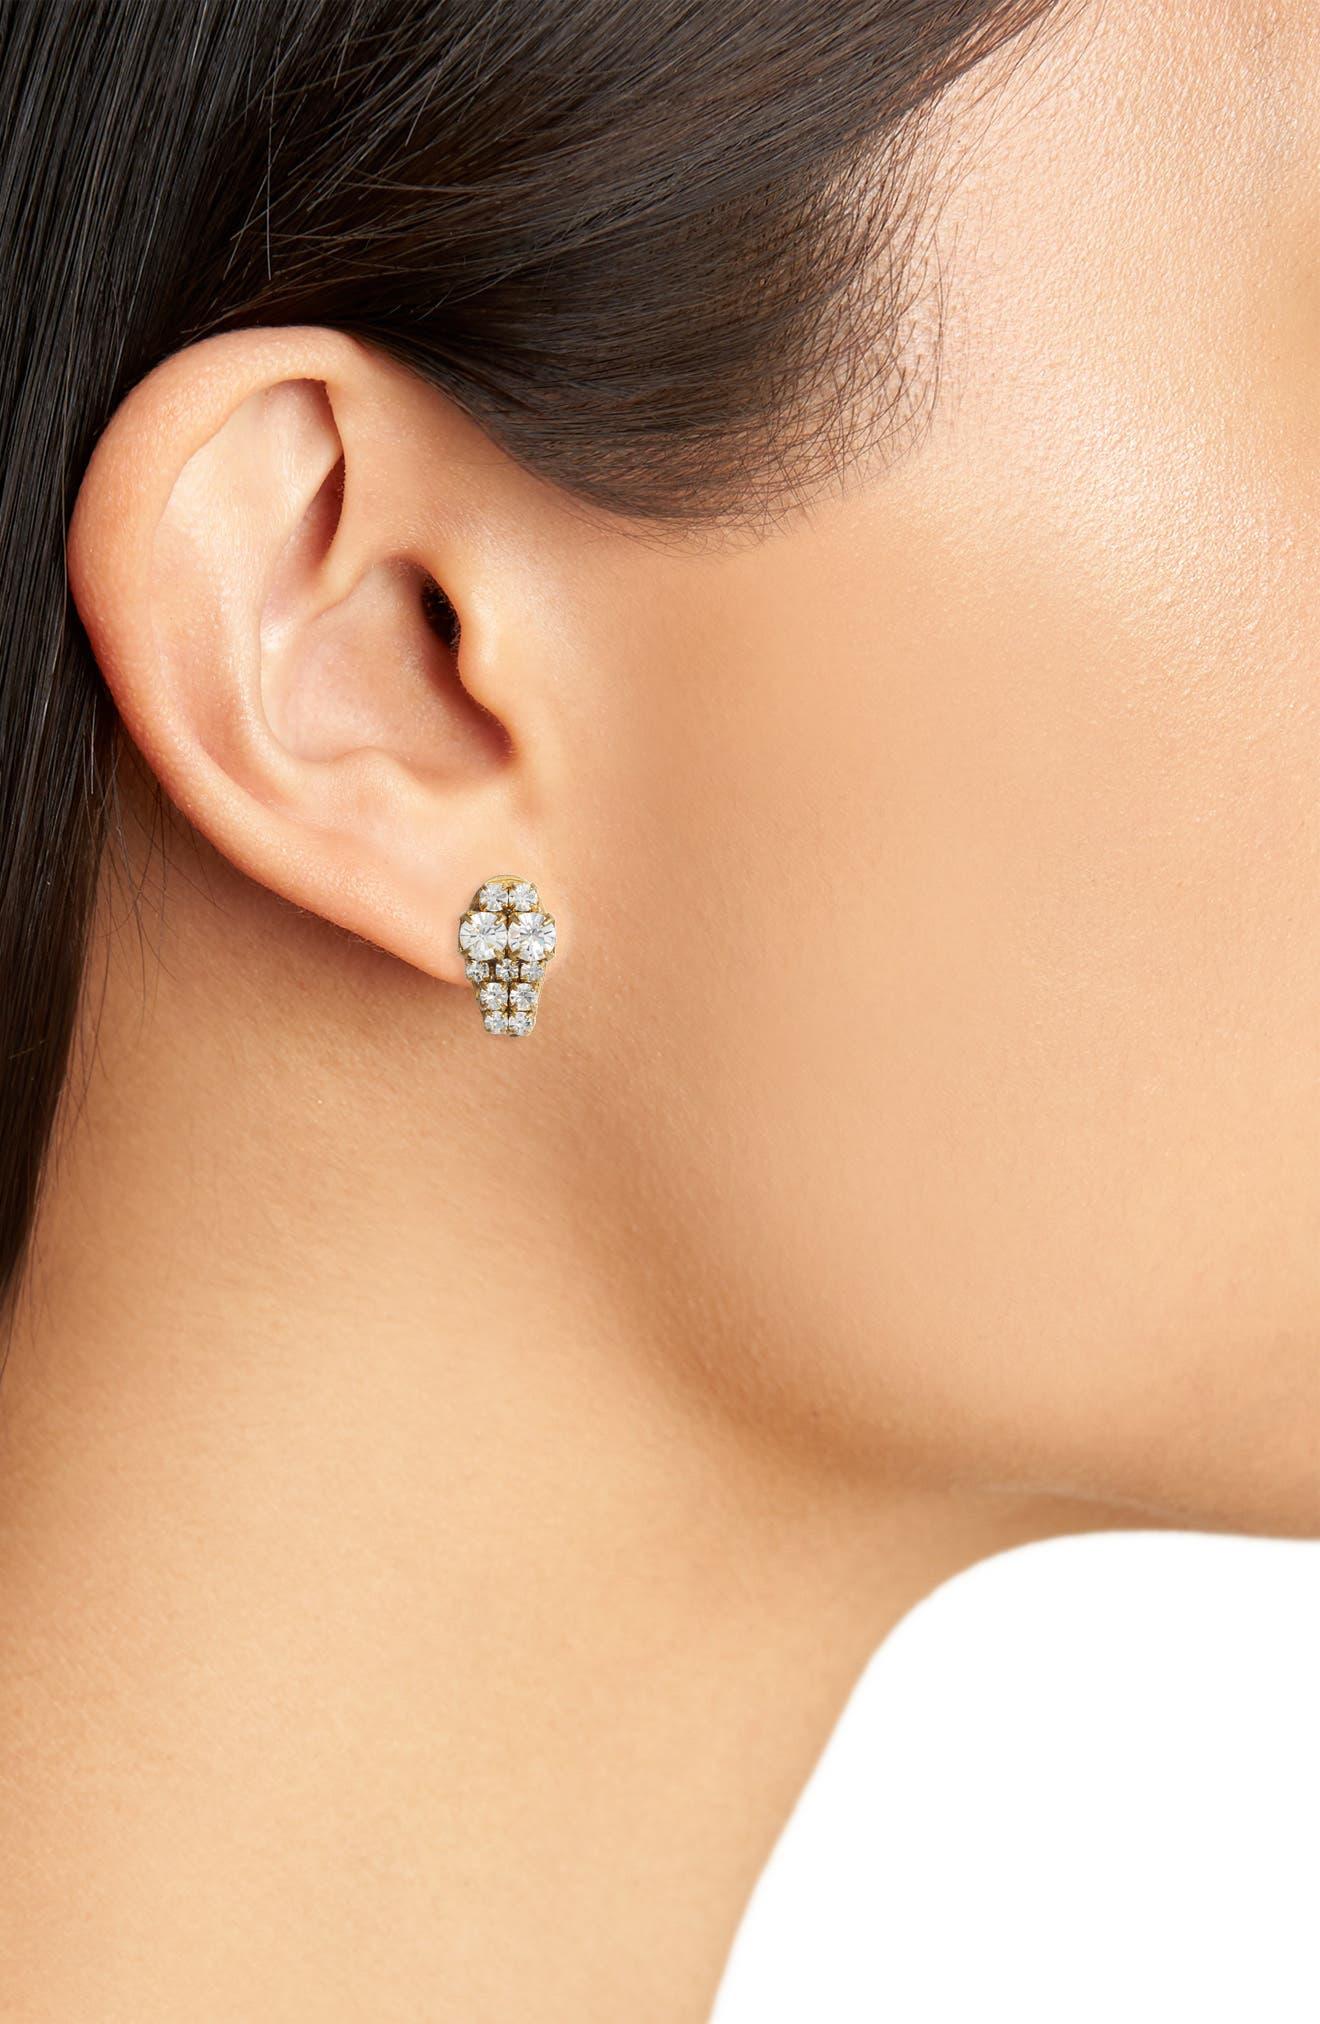 Graduated Crystal Stud Earrings,                             Alternate thumbnail 2, color,                             Crystal/ Gold